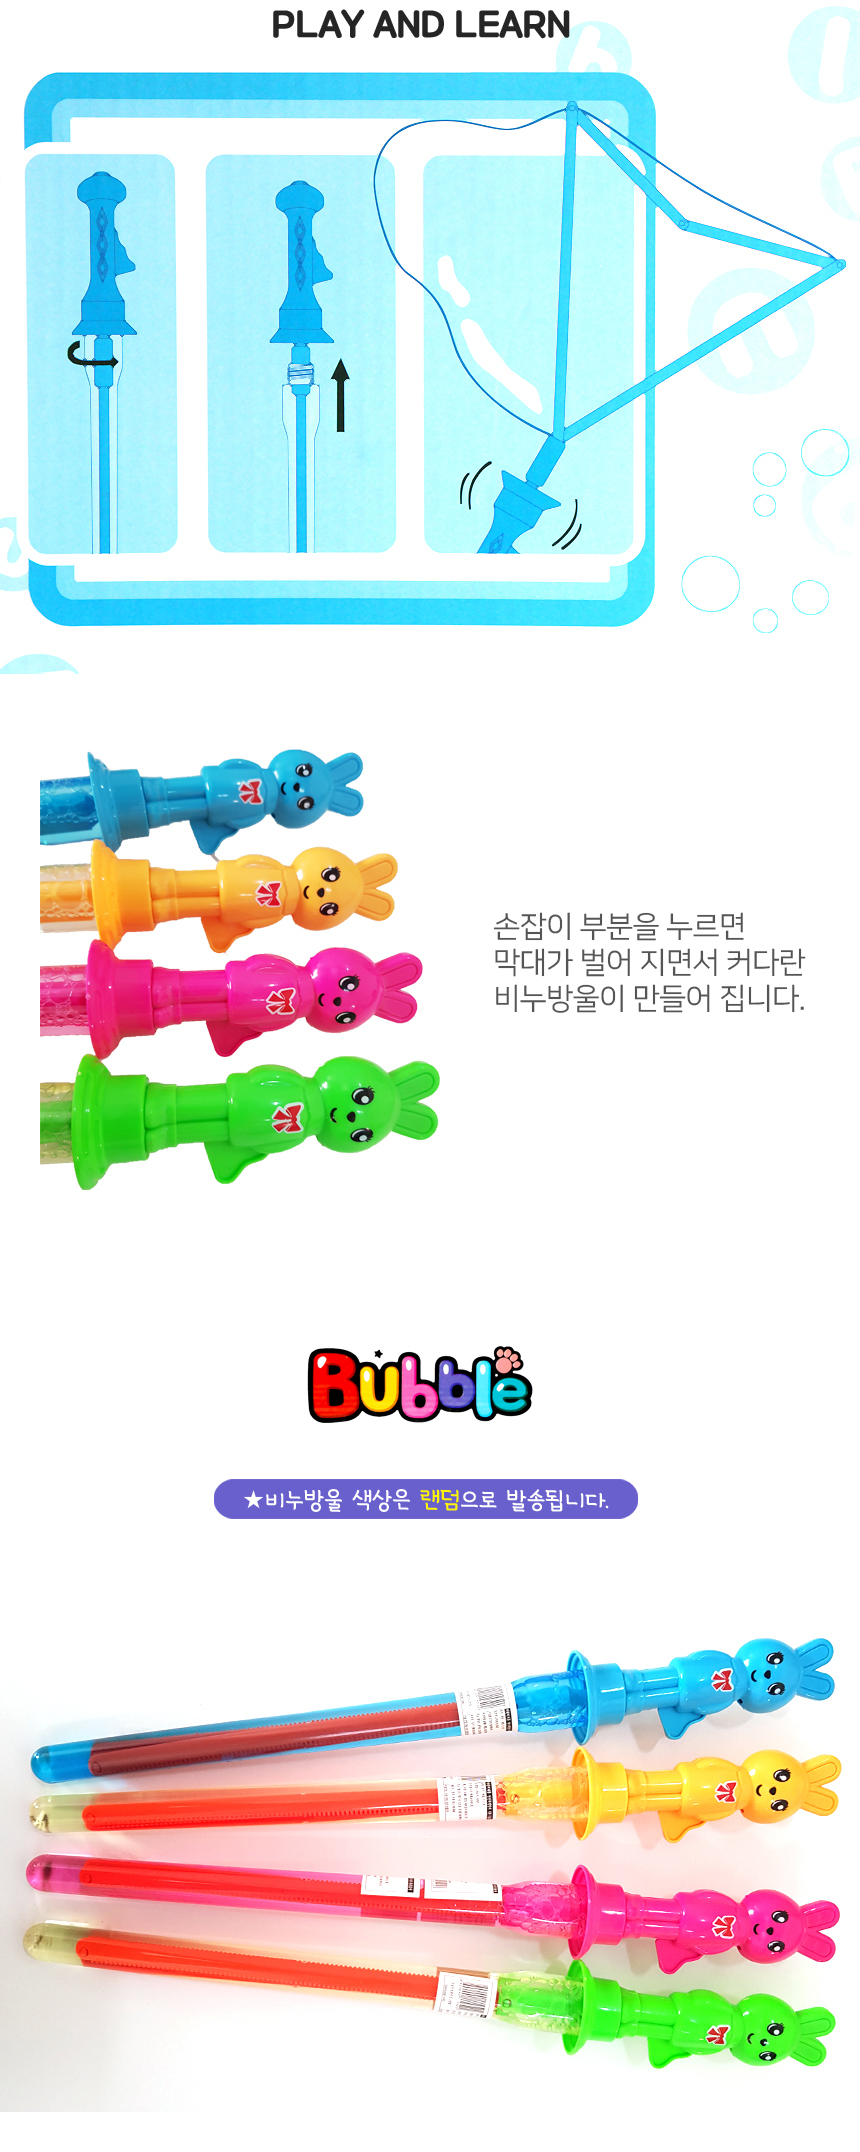 rabbitBubble_02.jpg